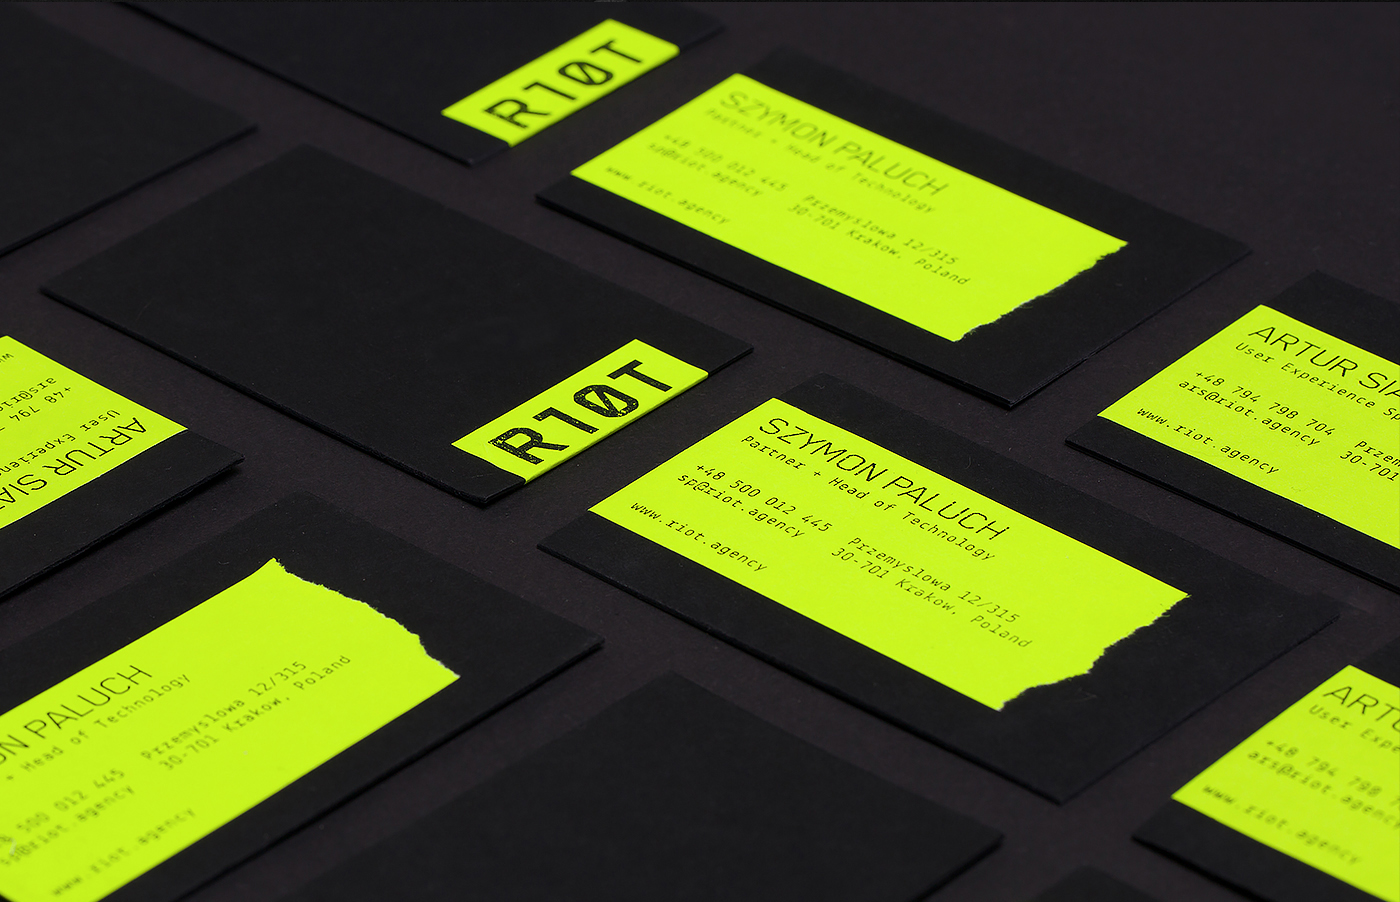 riot rebel Technology minimal stickers Glitch digital agency simple vibrant